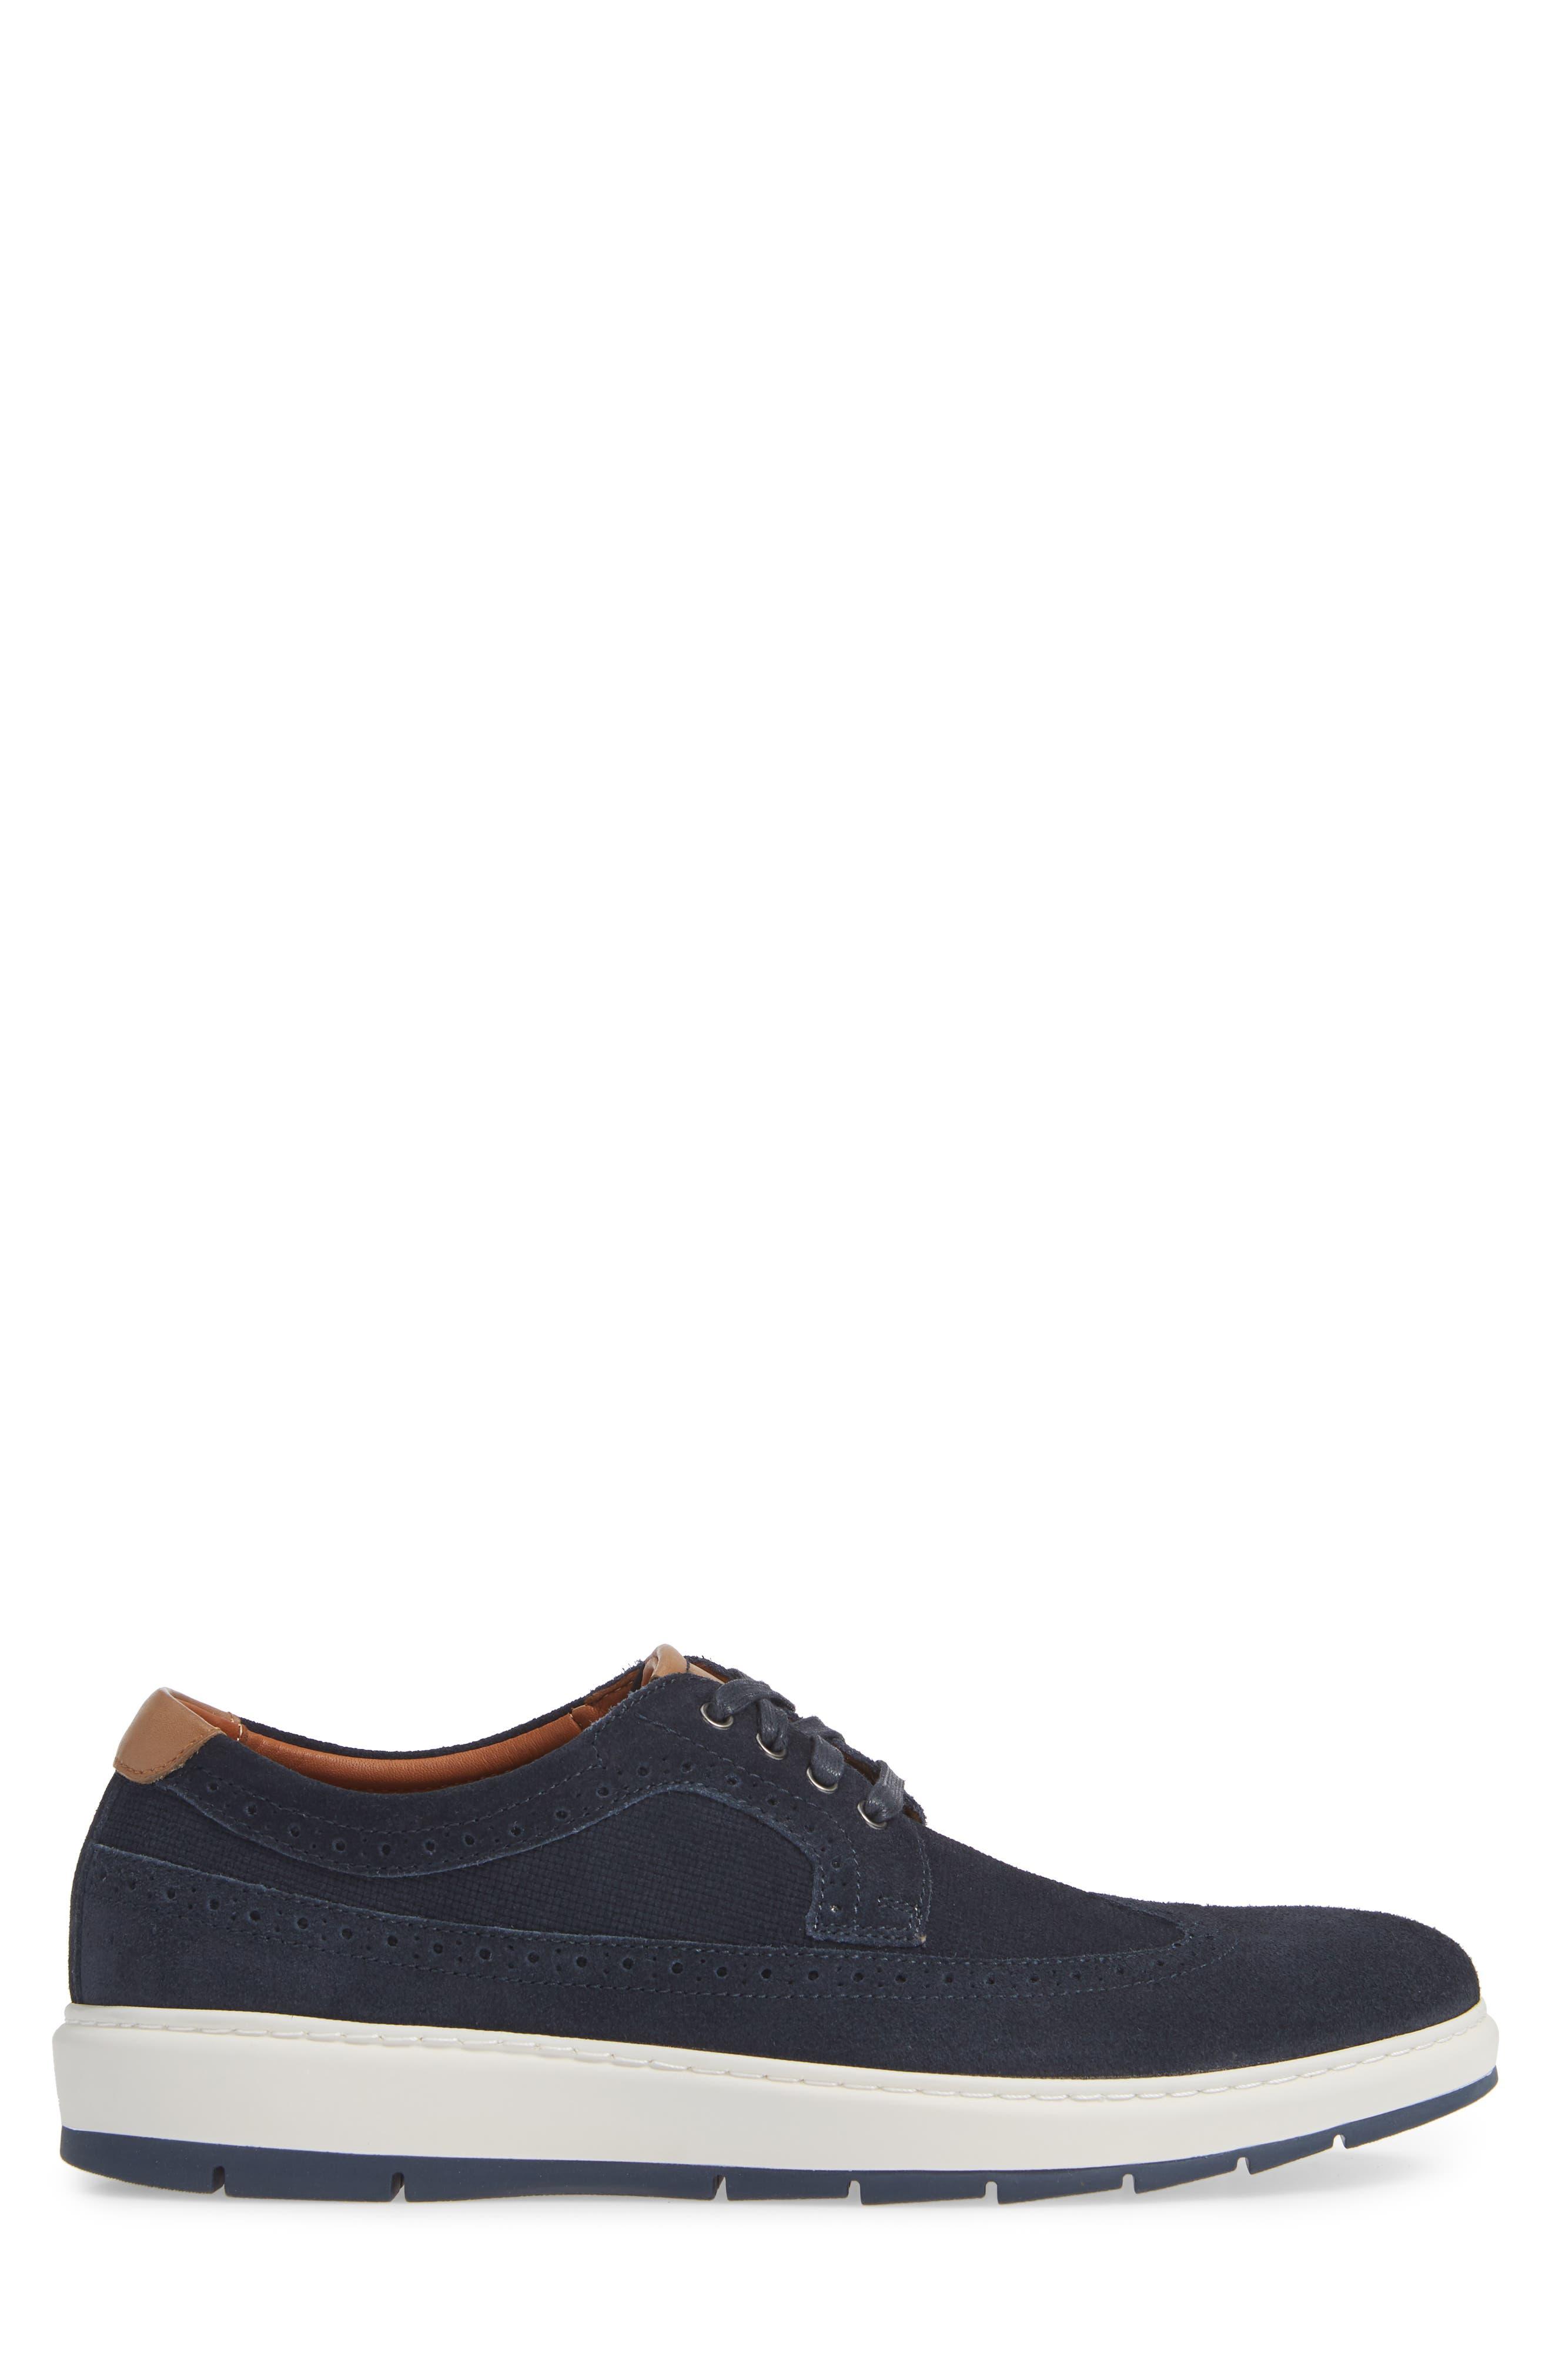 Elliston Wingtip Sneaker,                             Alternate thumbnail 3, color,                             NAVY SUEDE